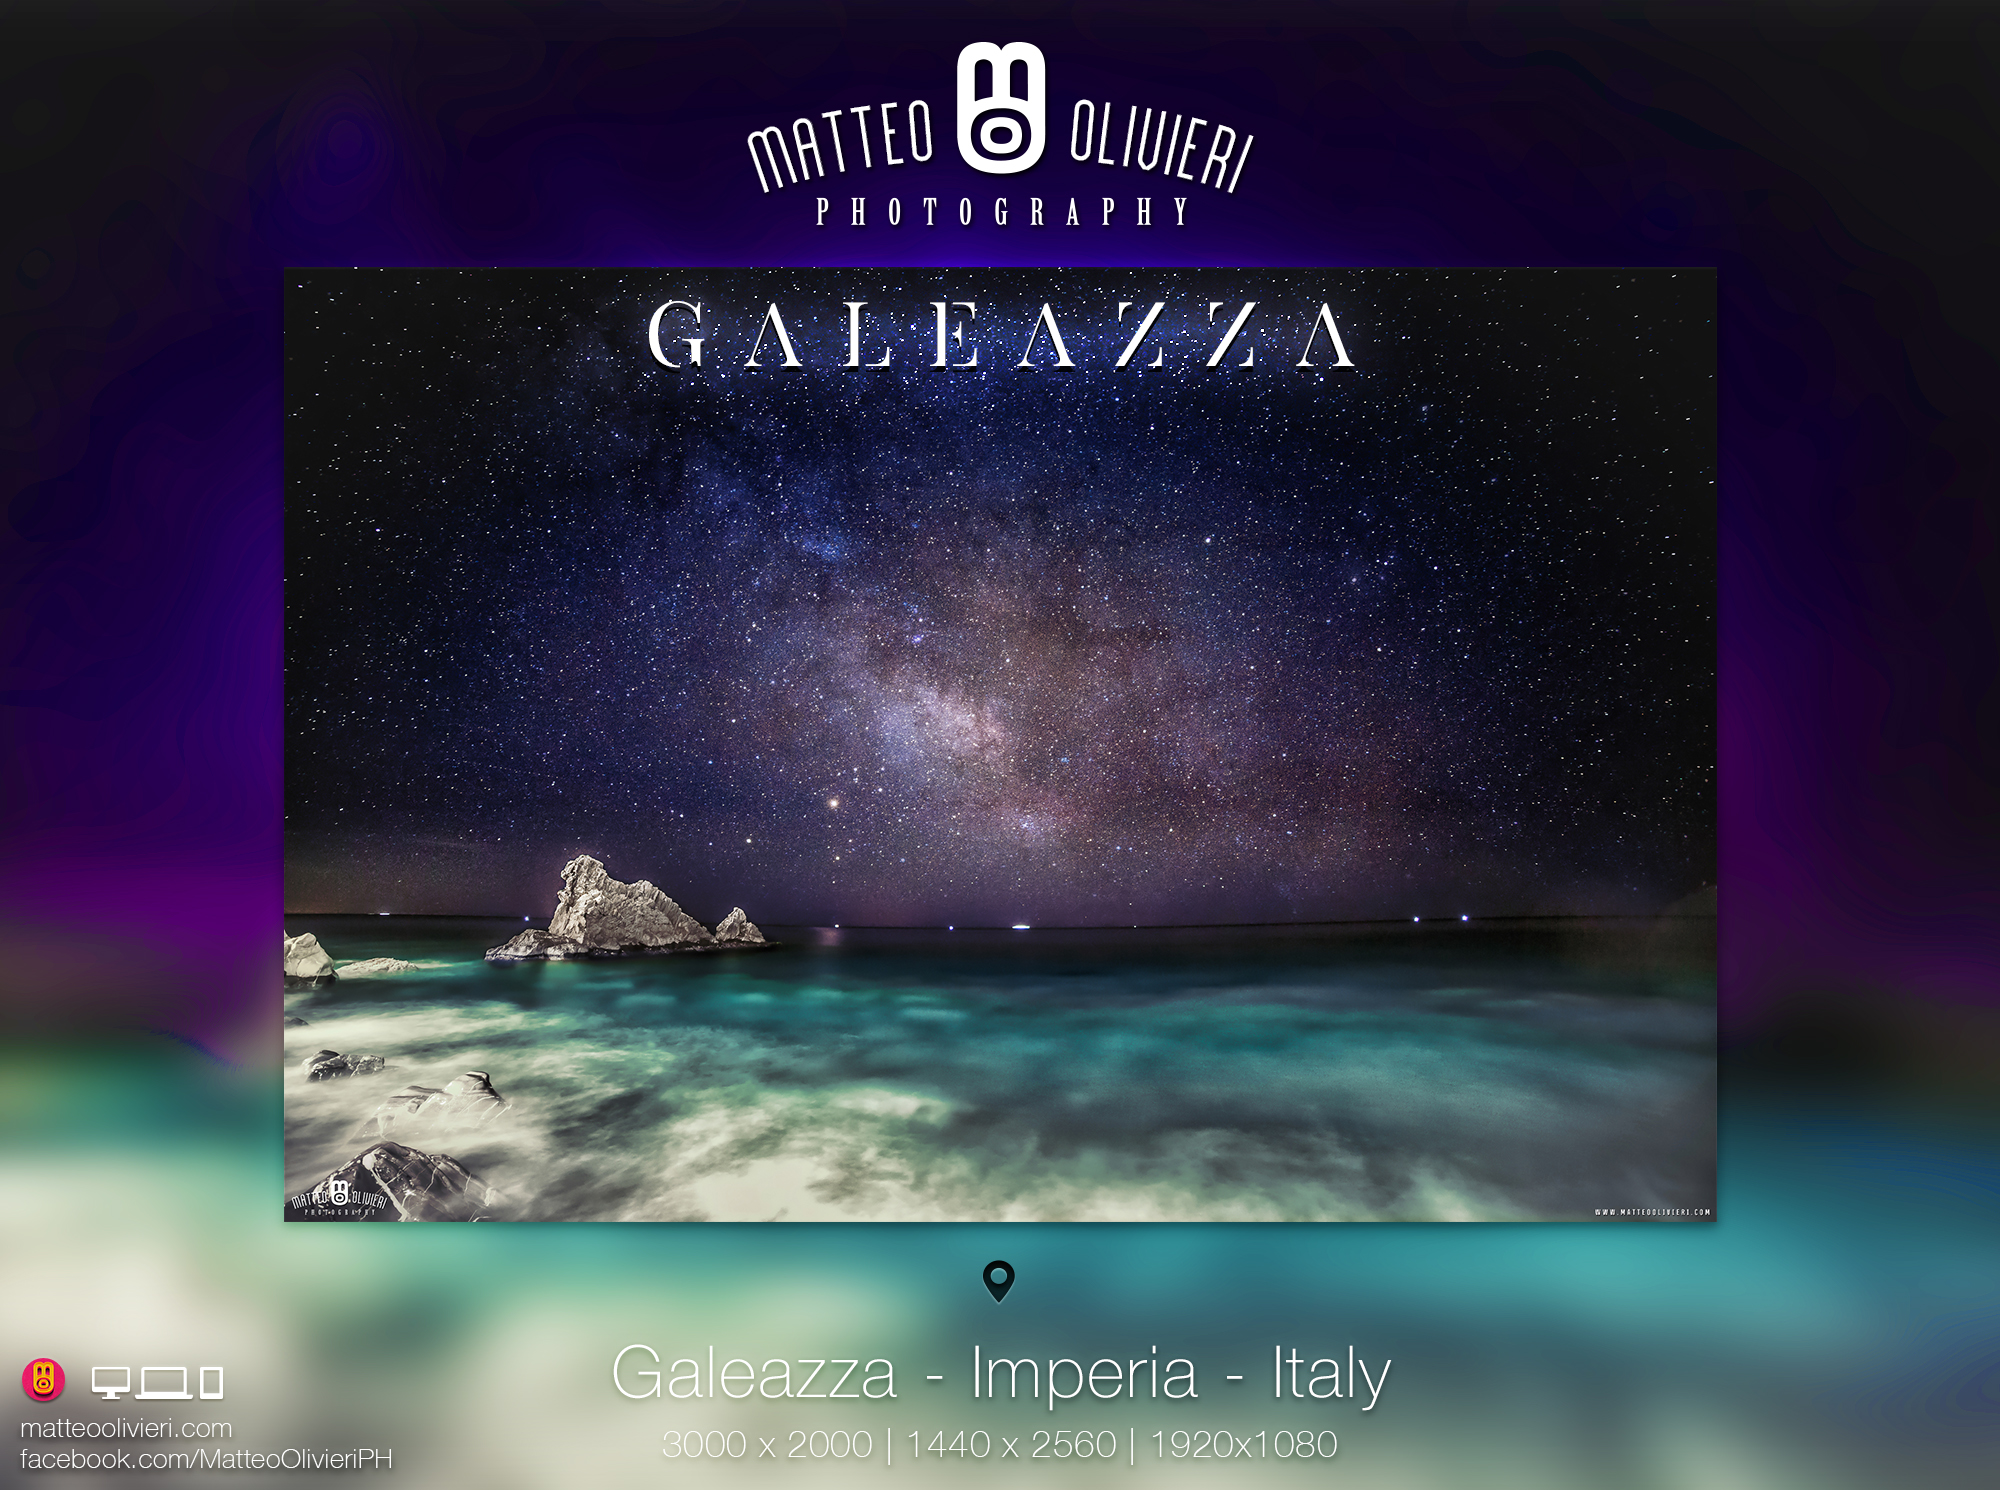 Galeazza